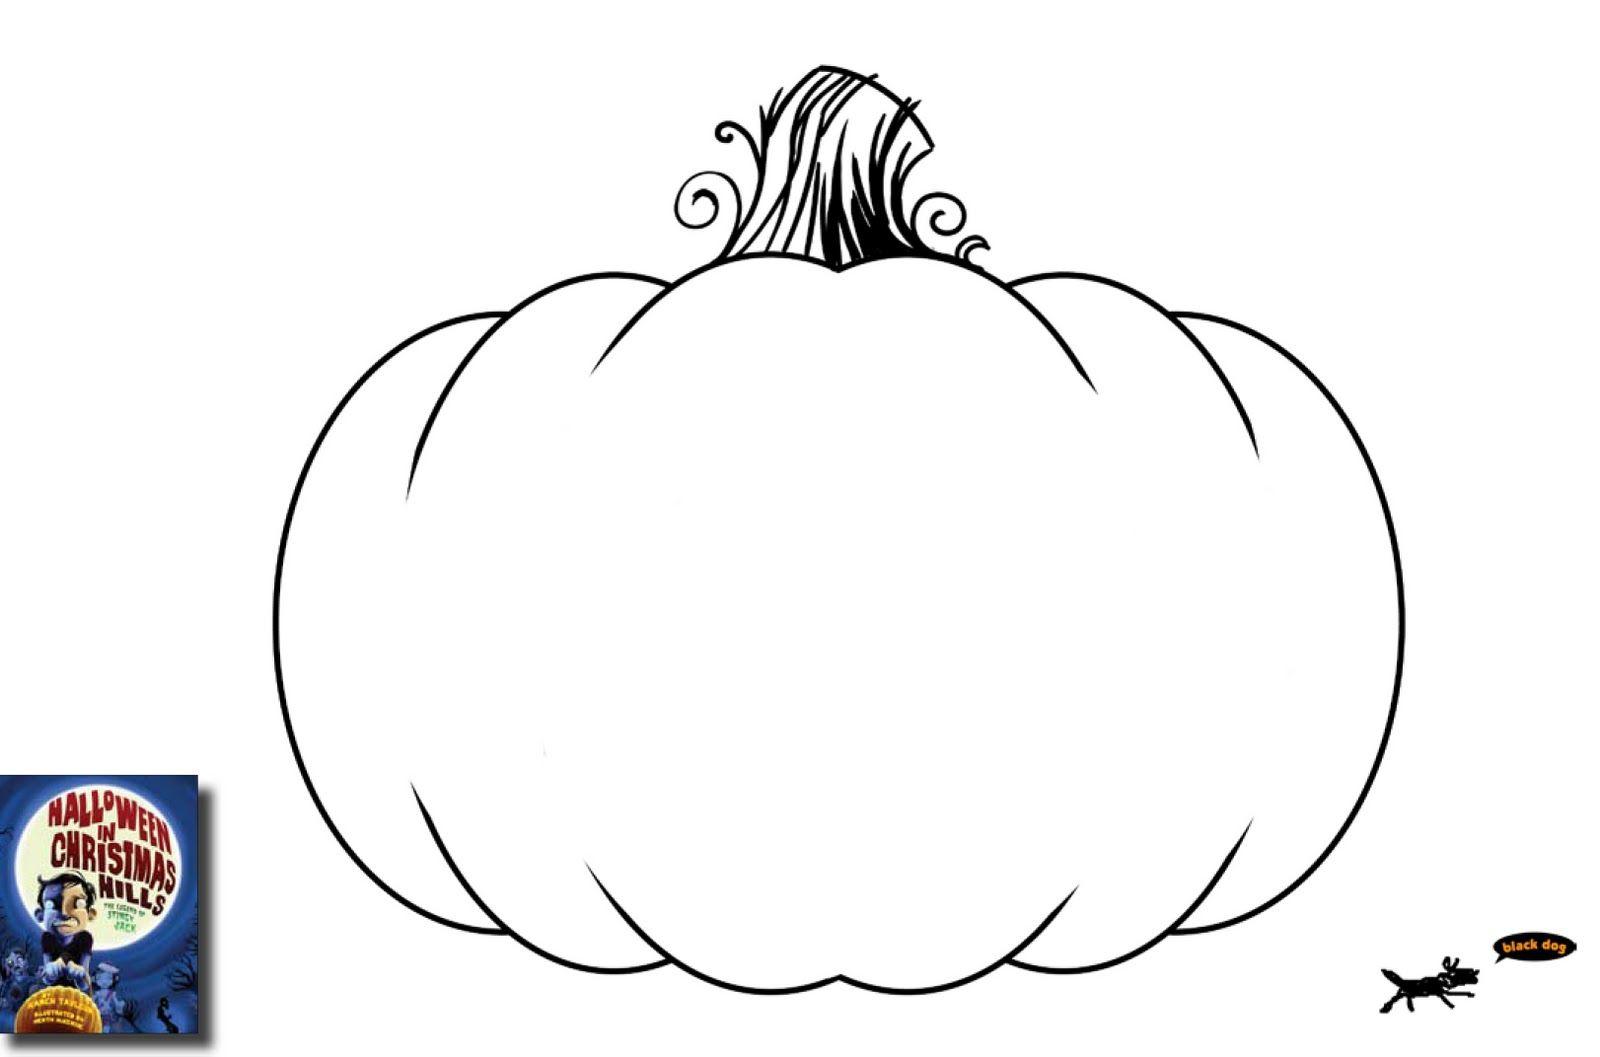 Outlines Of Pumpkins